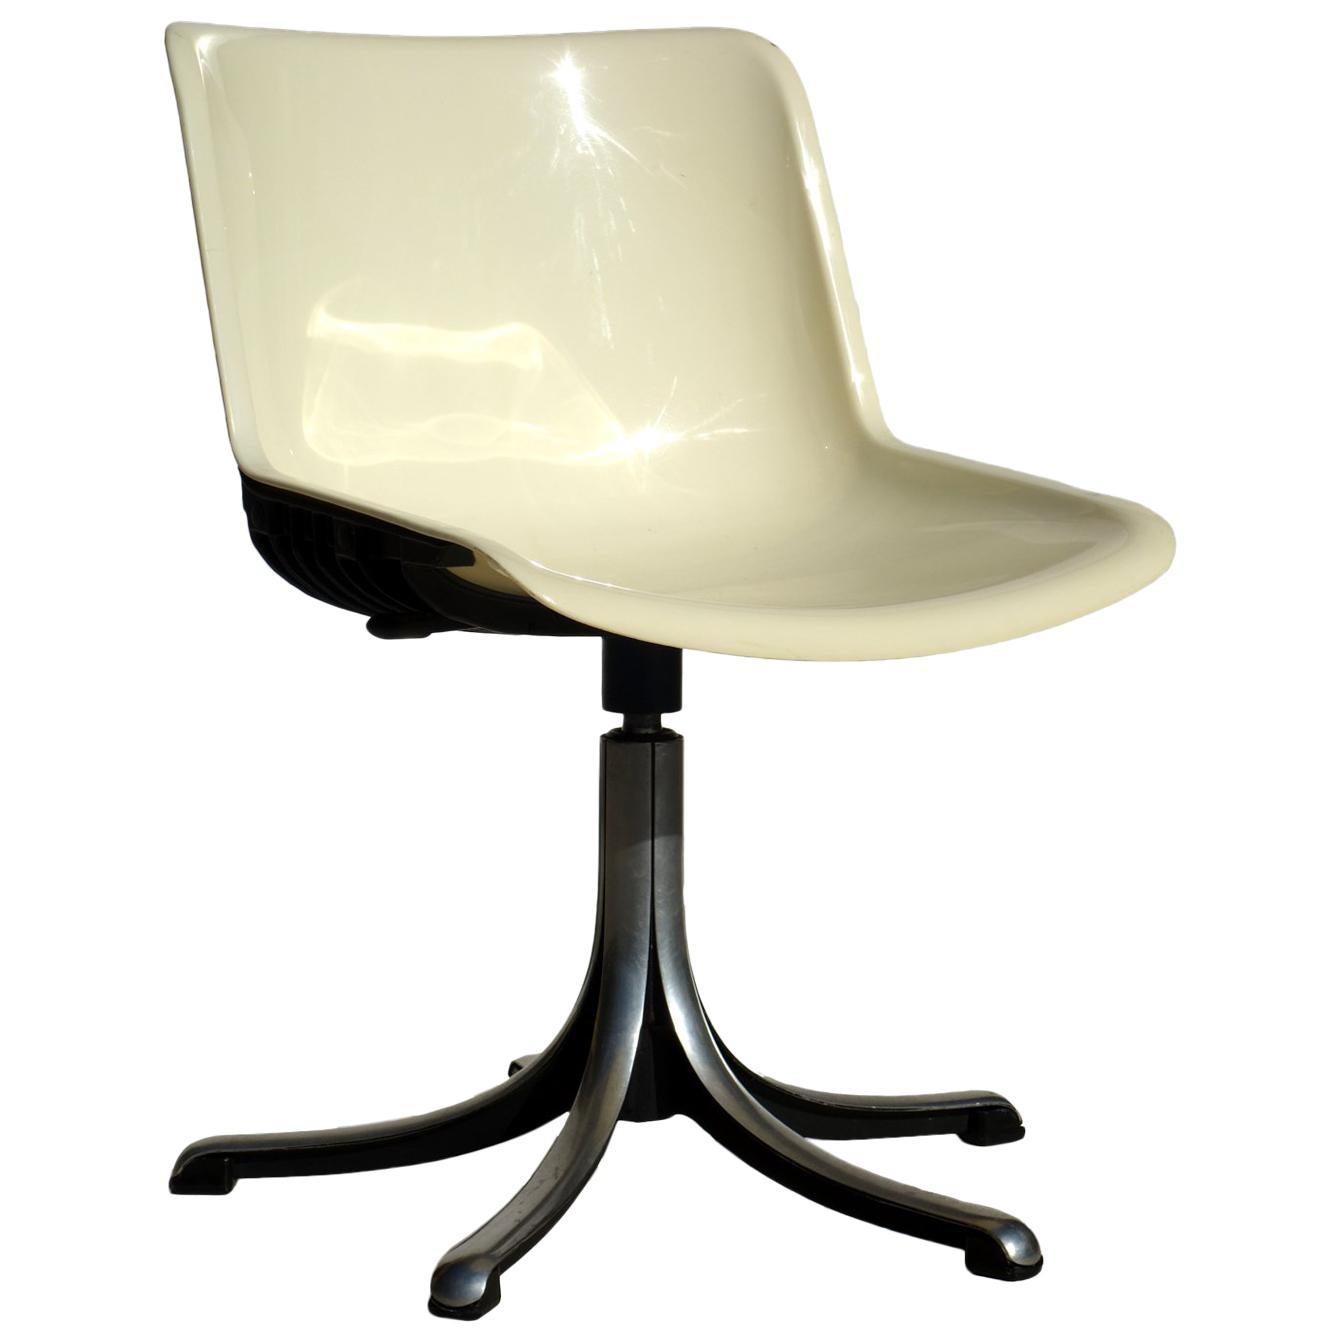 revolving chair pride mobility lift chairs modus office by osvaldo borsani for tecno 1960s desk sale